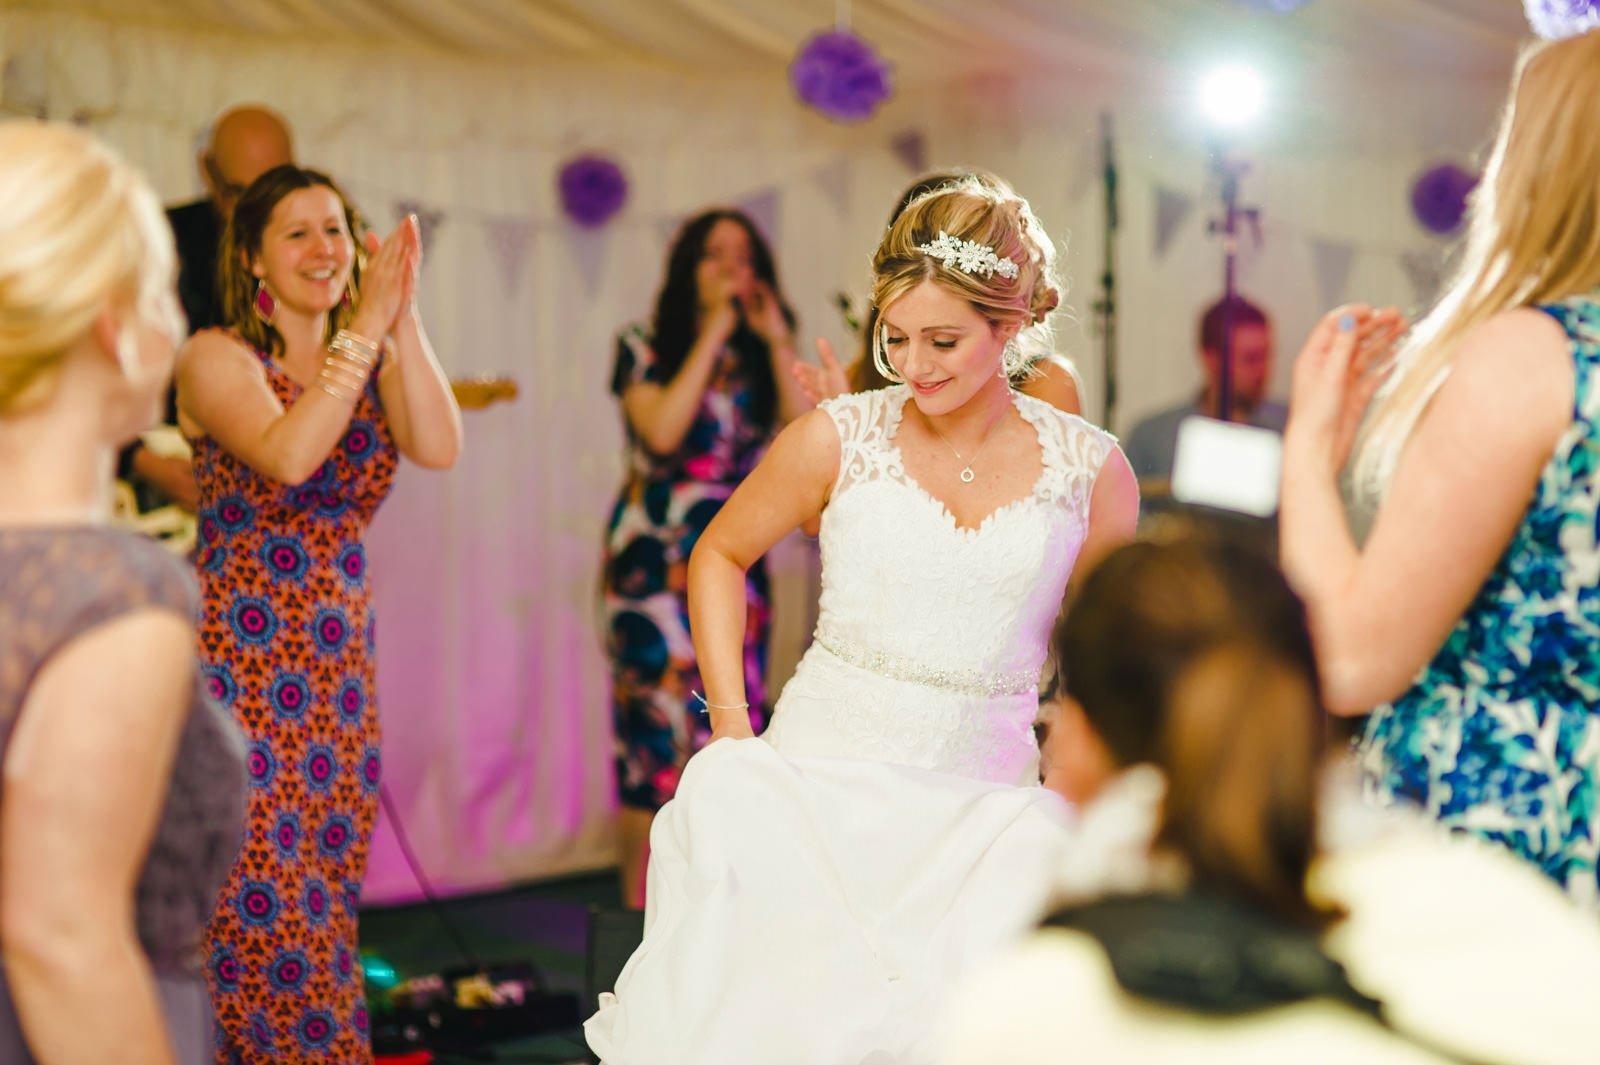 Millers Of Netley wedding, Dorrington, Shrewsbury | Emma + Ben 96